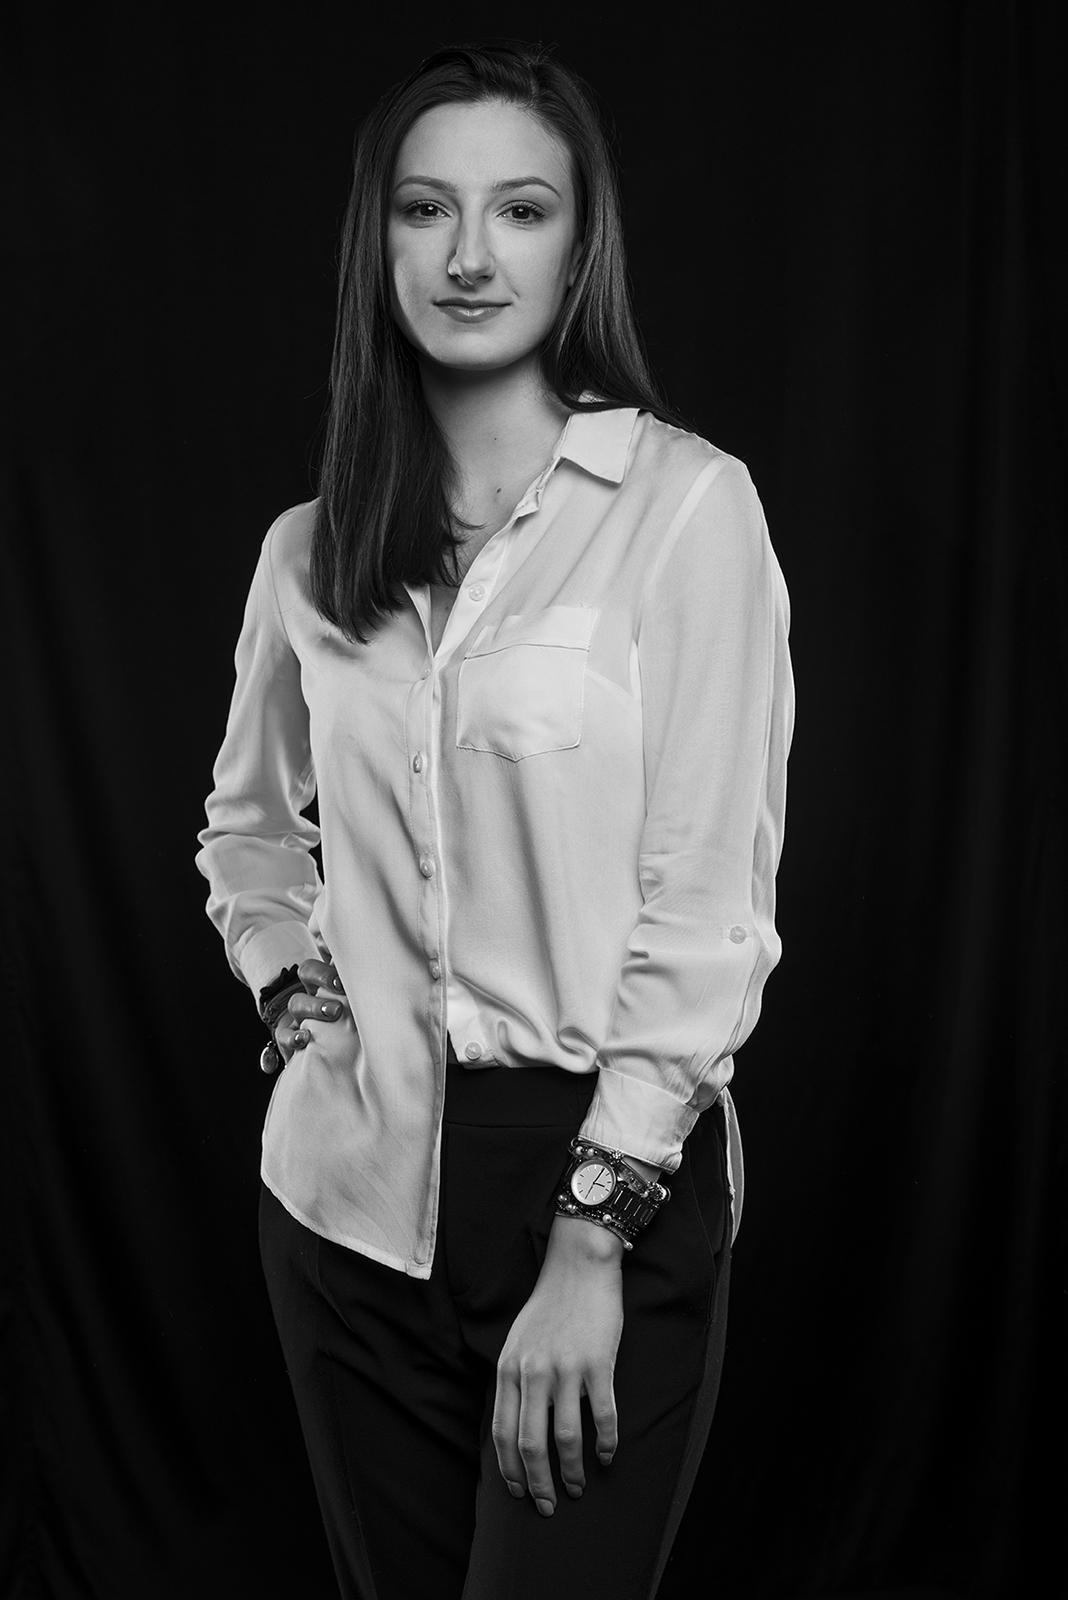 Klaudia Sadowska